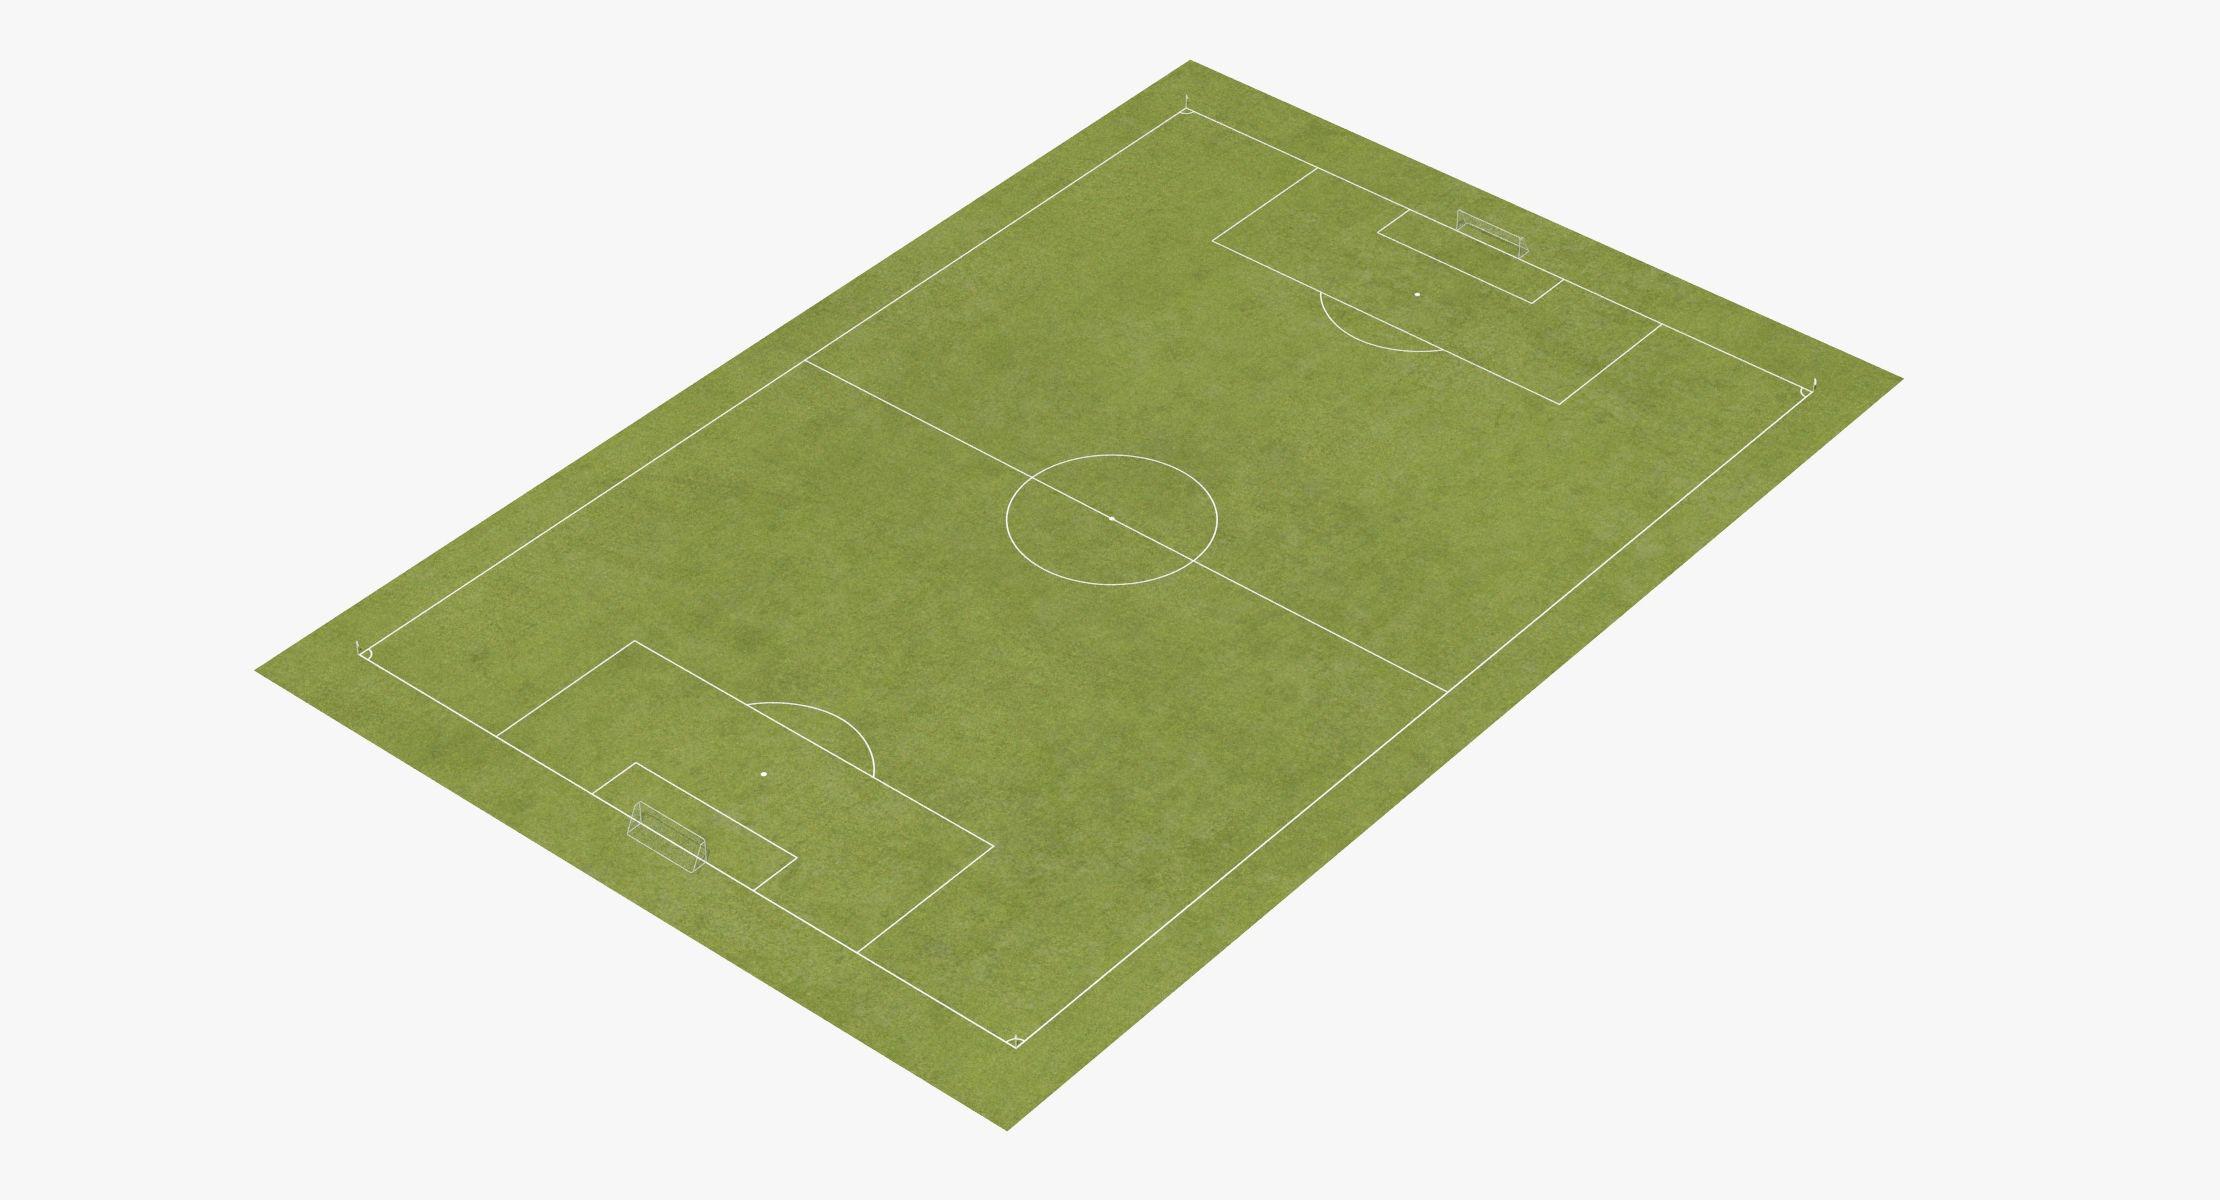 Soccer Pitch - reel 1